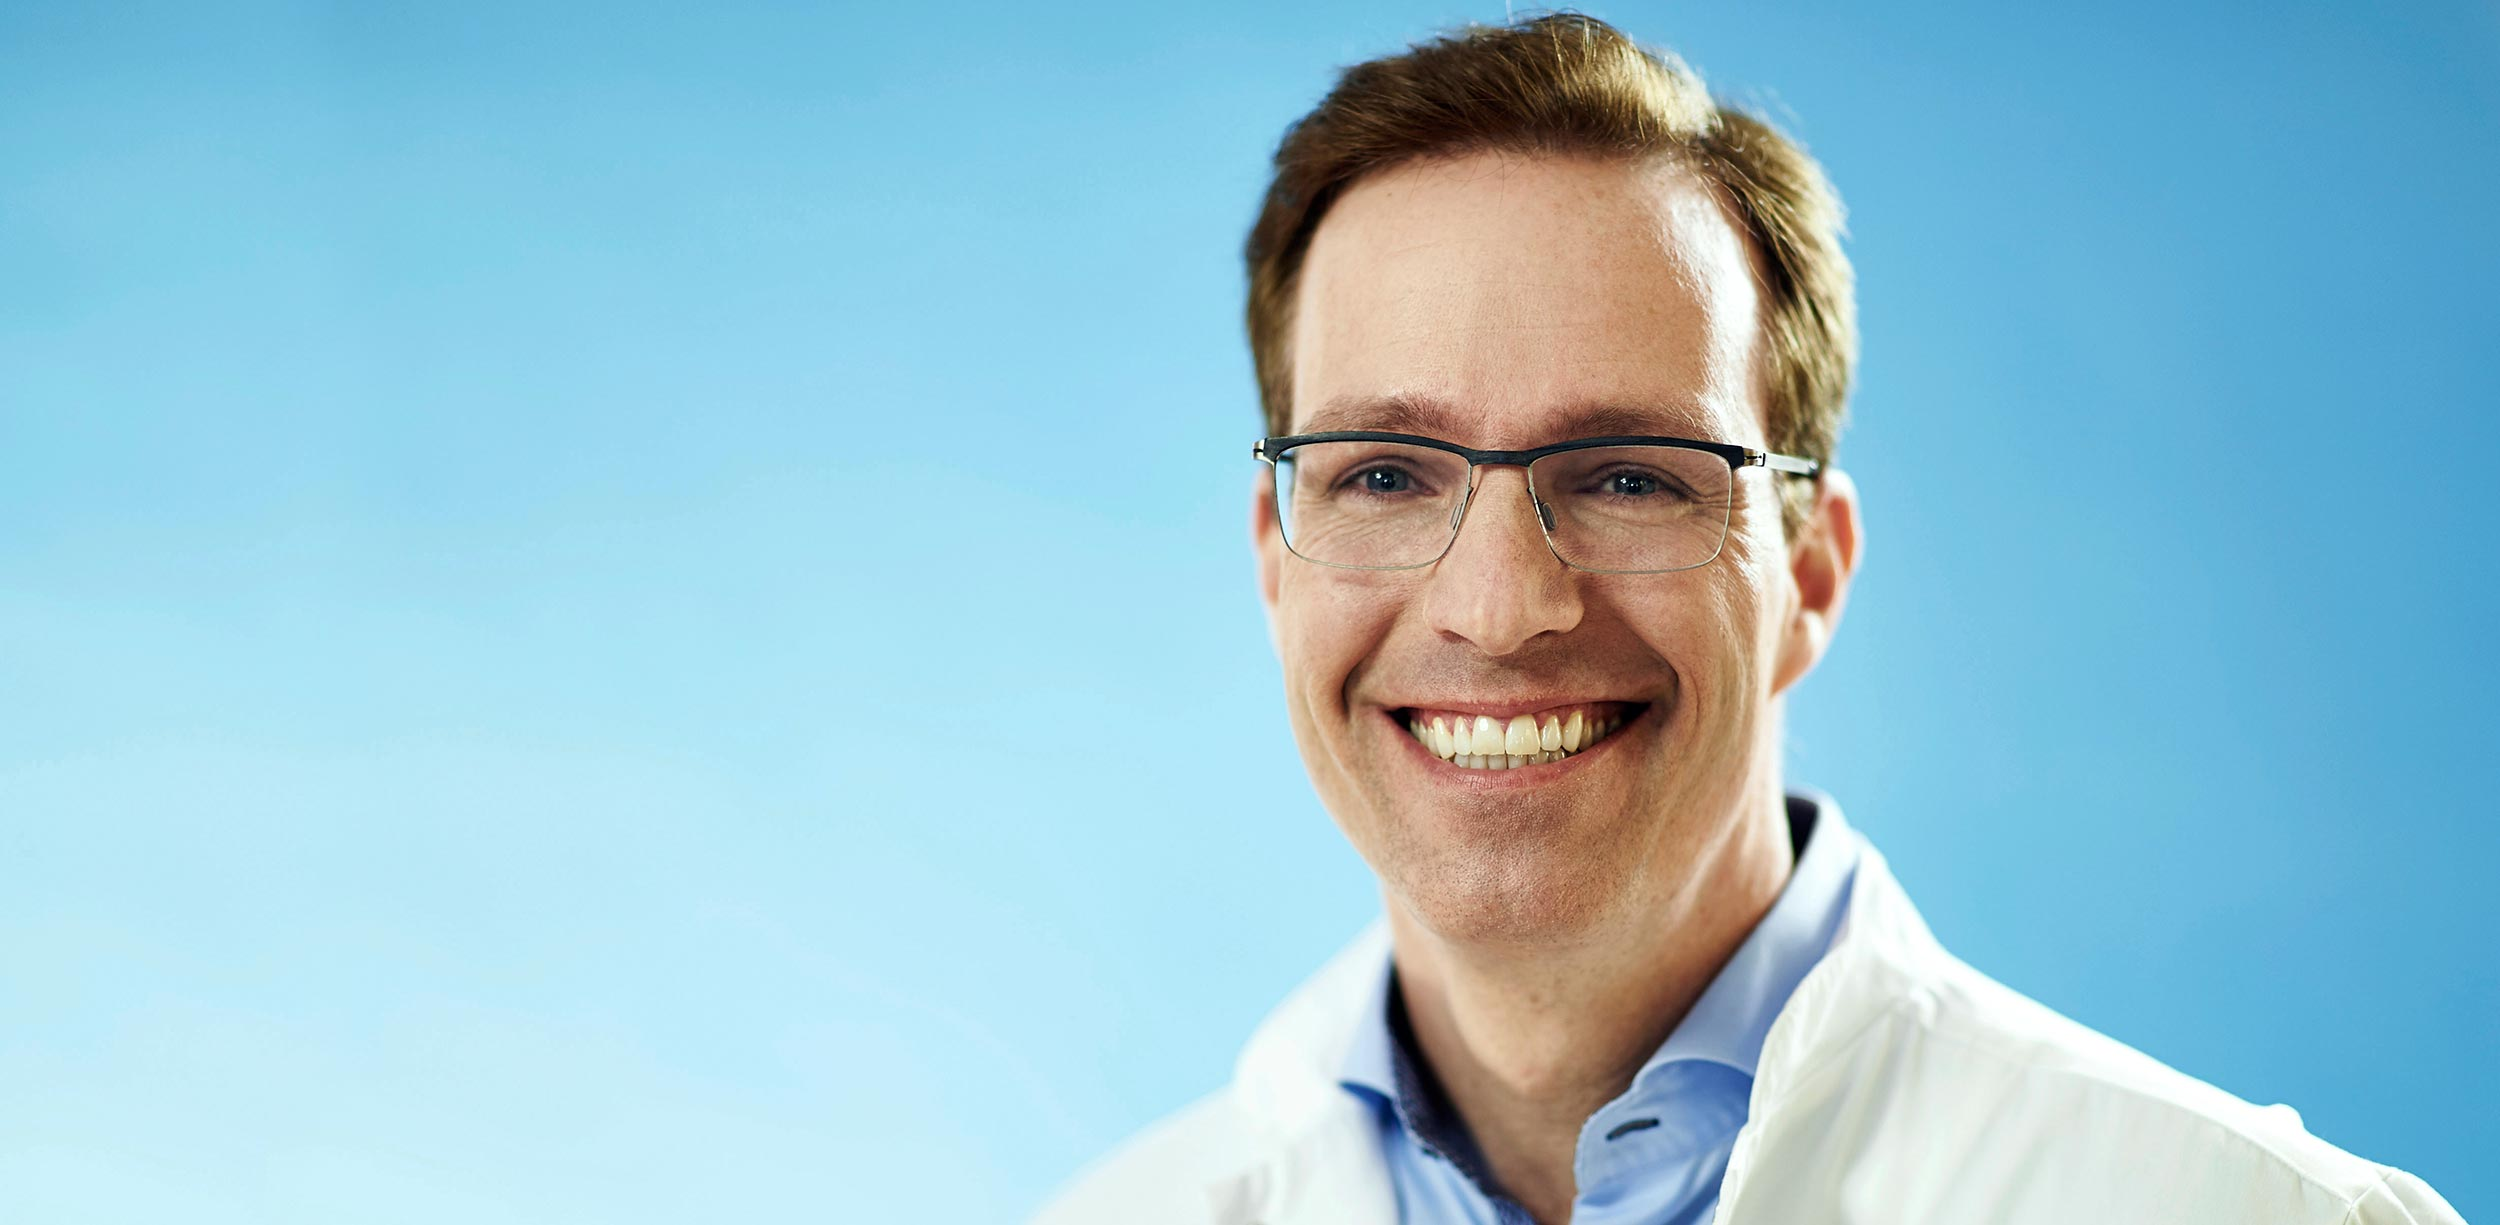 Professor Jörg Pelz